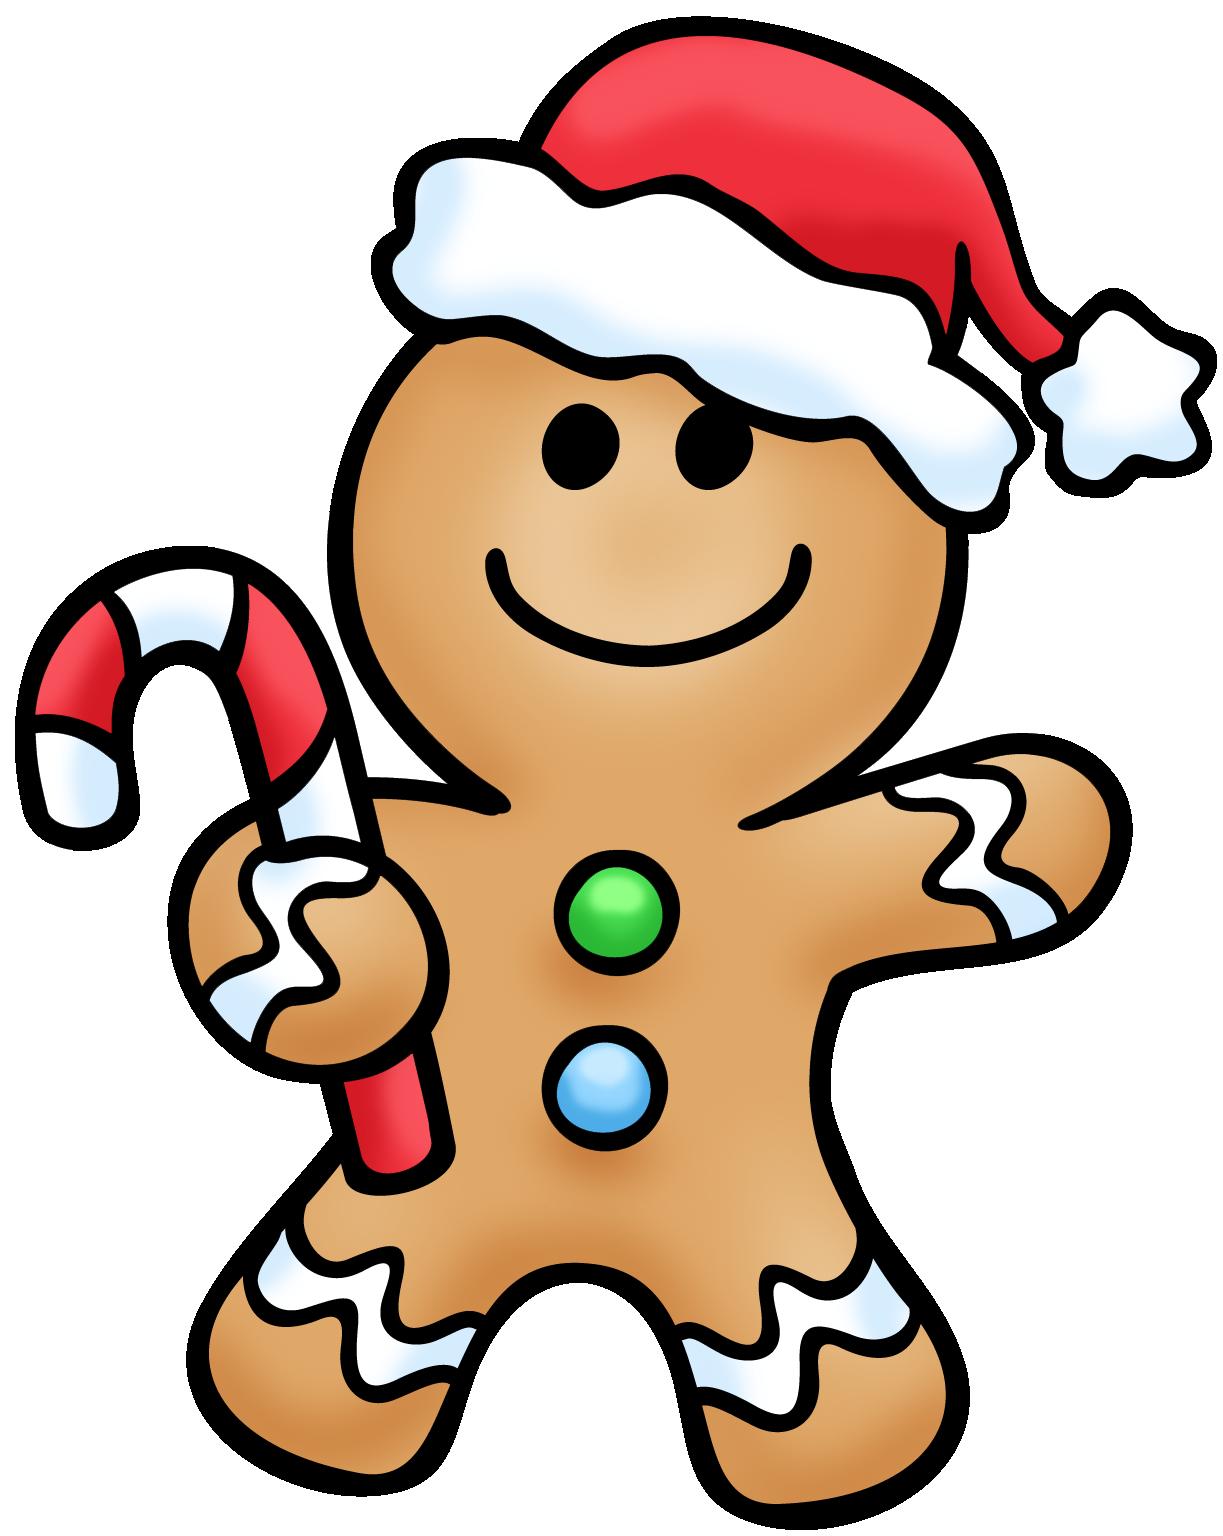 Gingerbread man clip art images illustrations photos